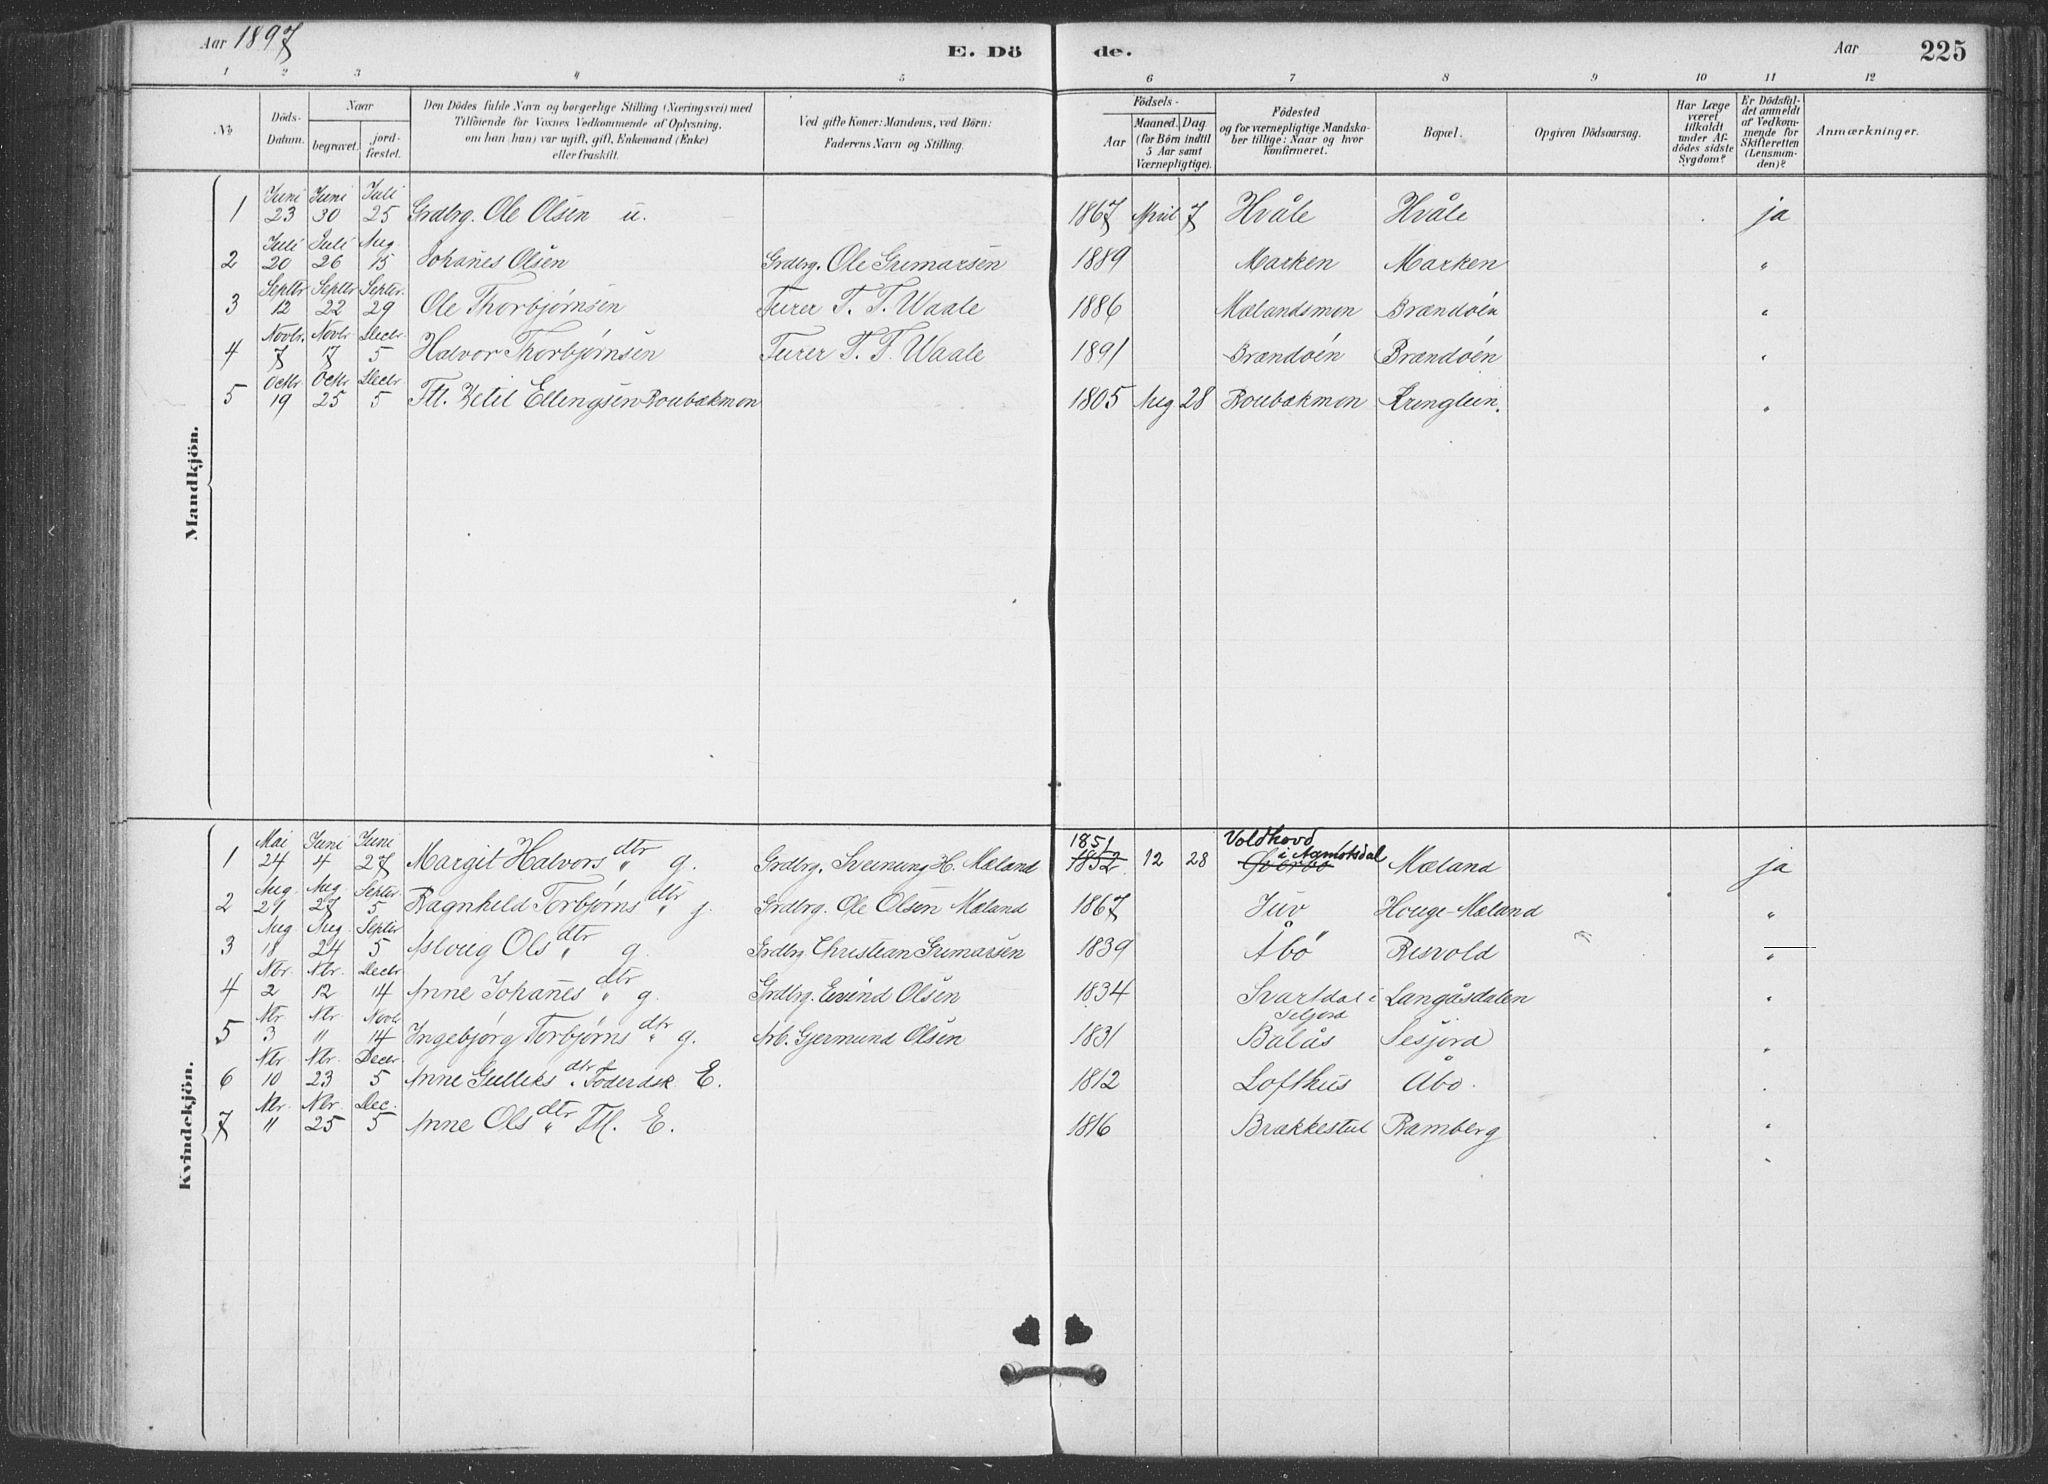 SAKO, Hjartdal kirkebøker, F/Fa/L0010: Ministerialbok nr. I 10, 1880-1929, s. 225